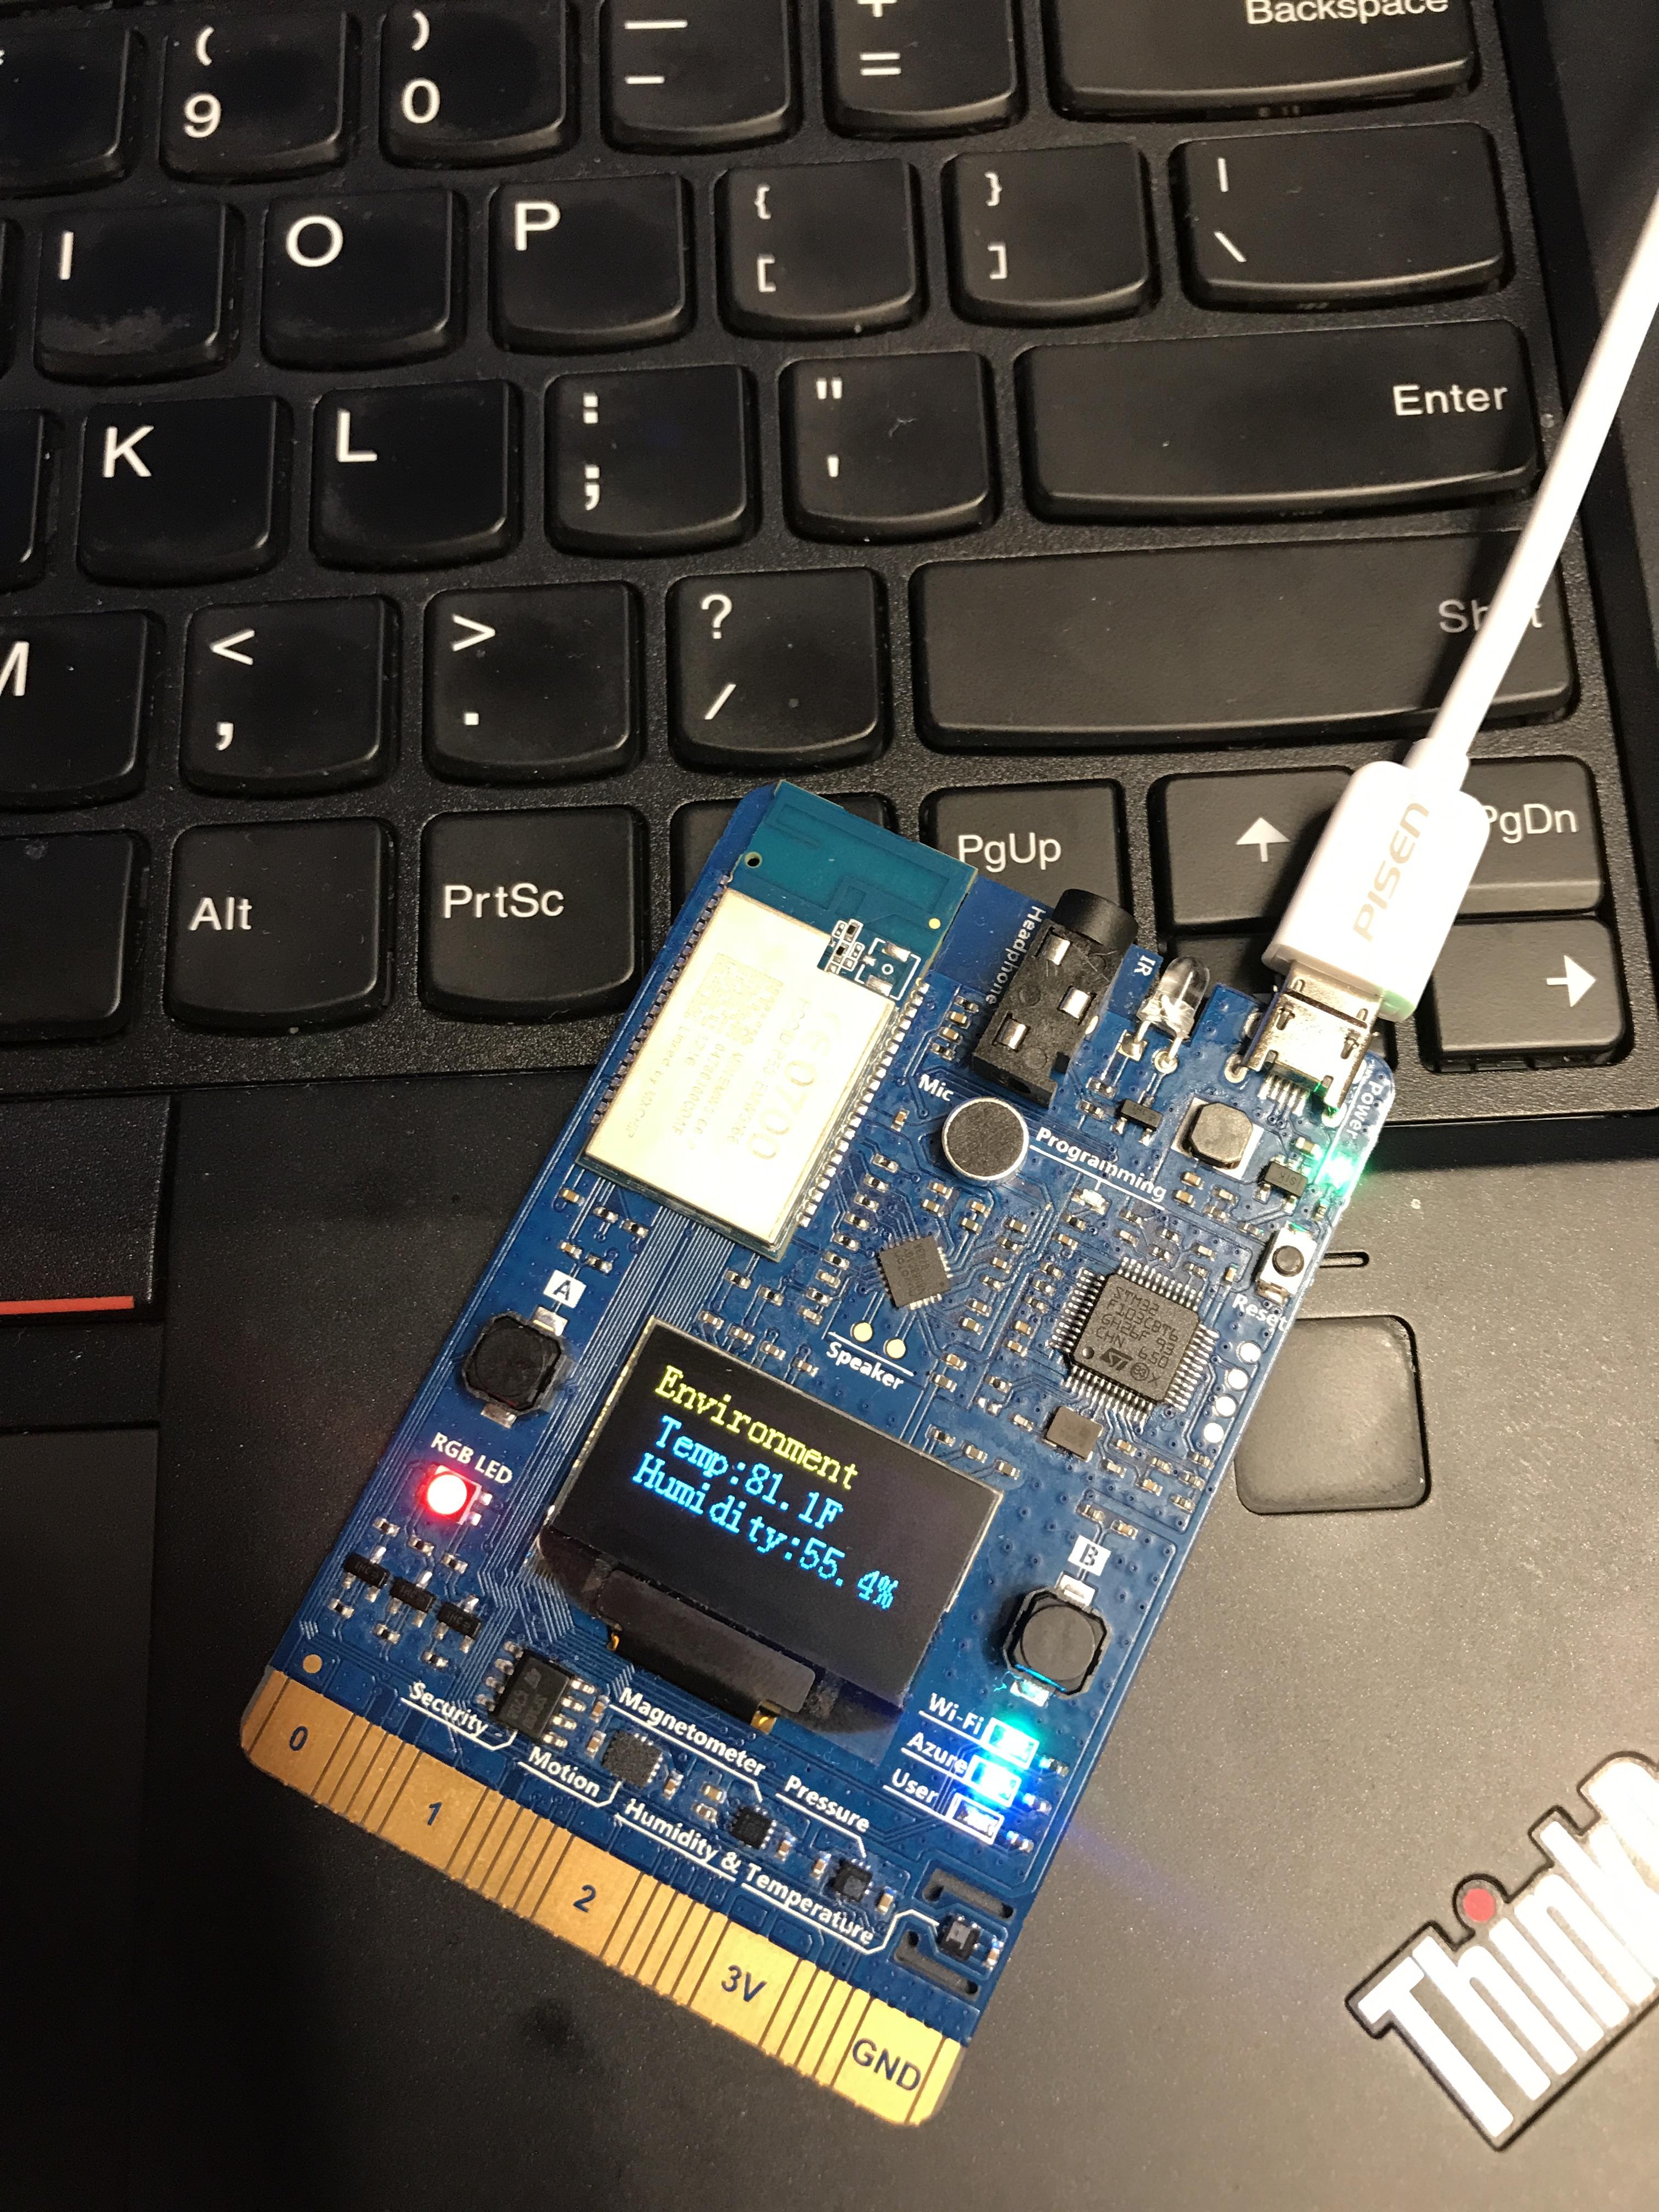 Send sensor data